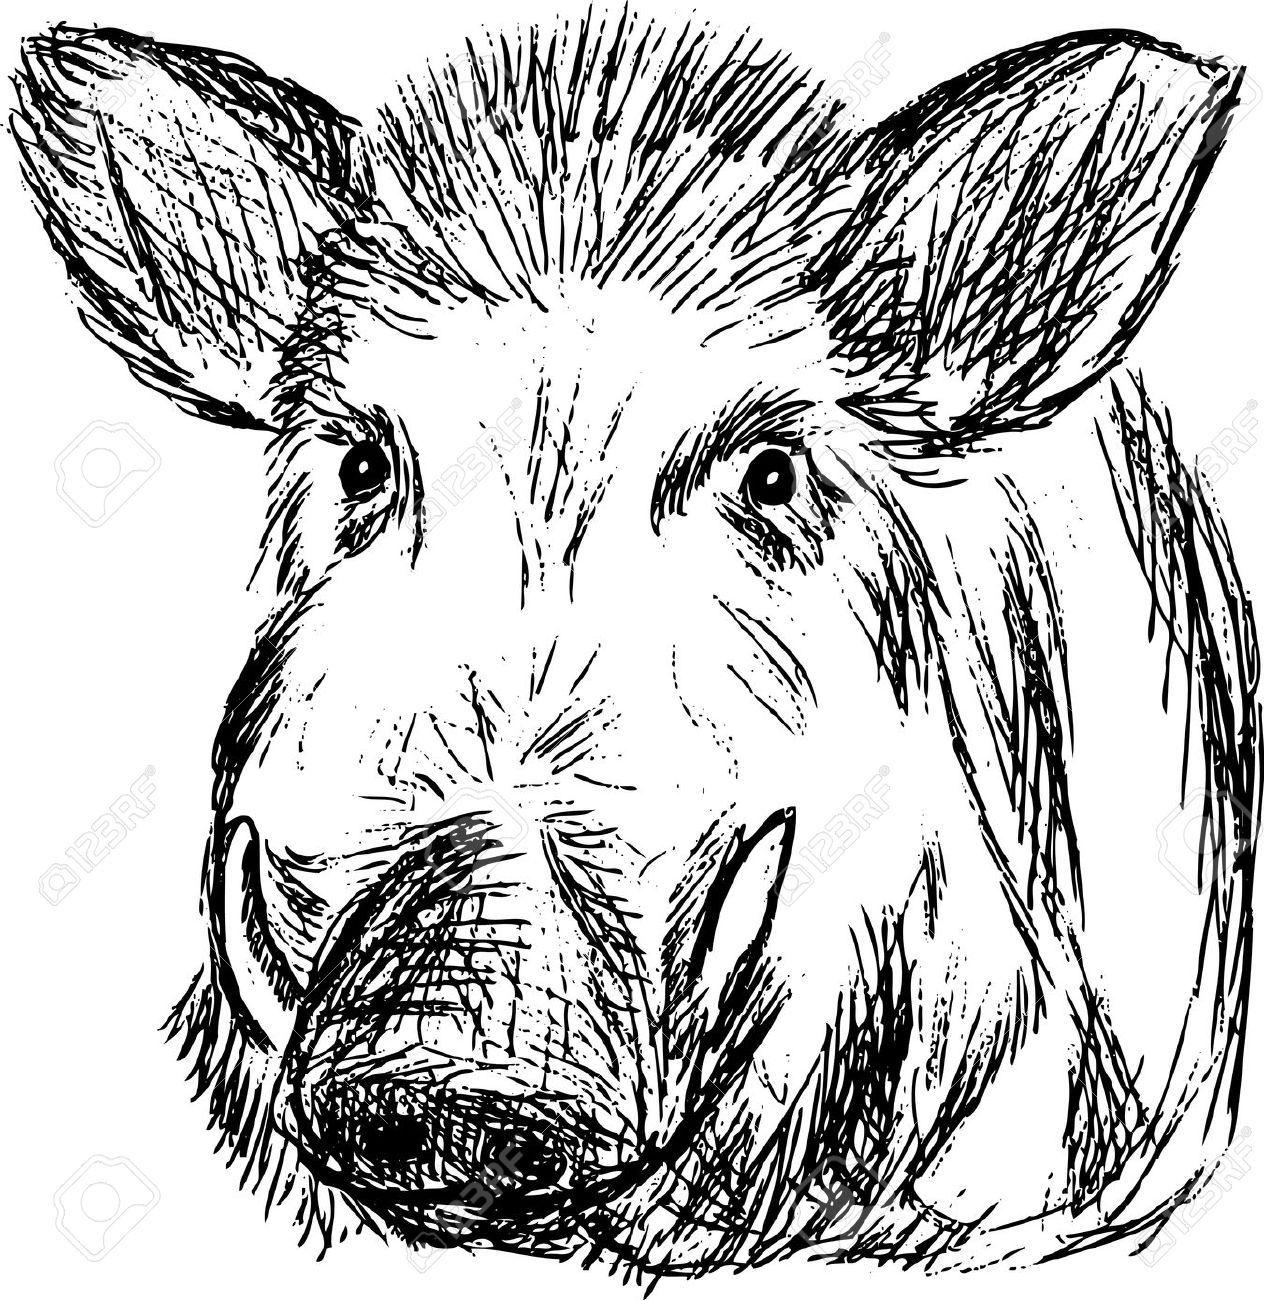 drawing wild boar - Google zoeken